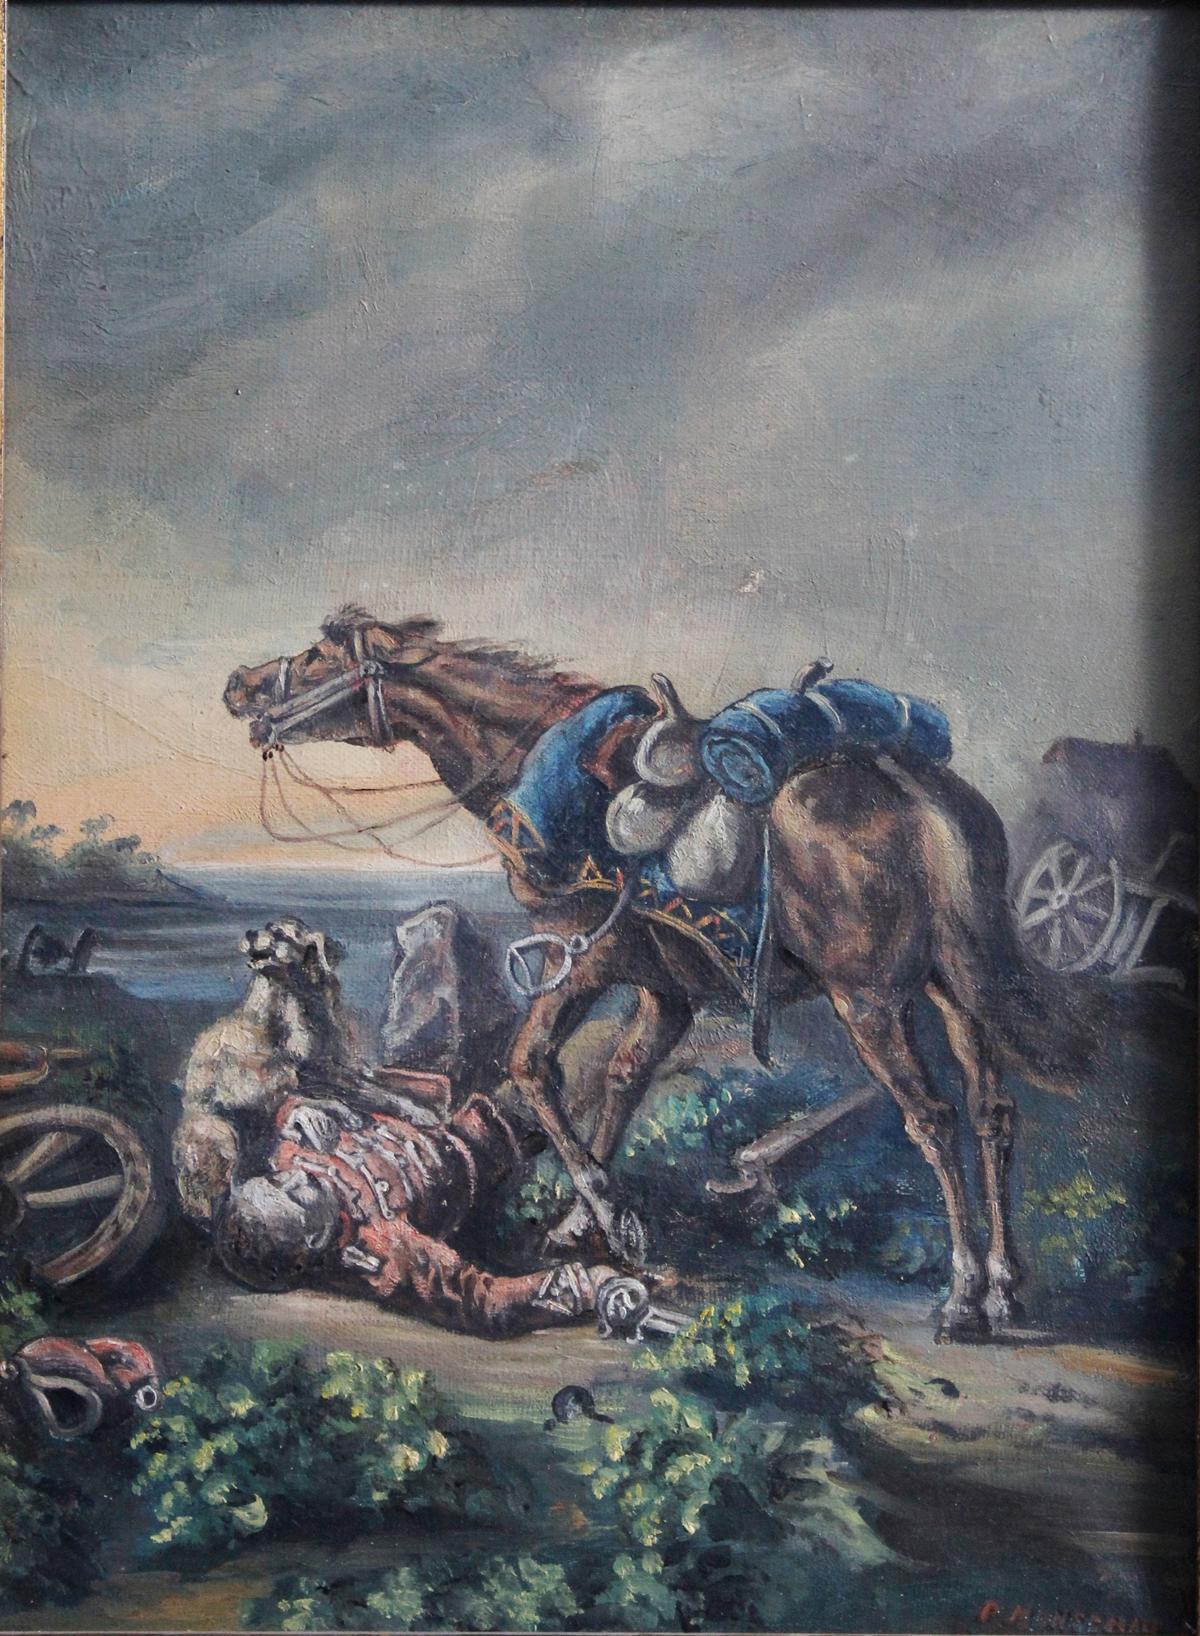 Gefallener Soldat. Gemälde 19. Jahrhundert-2